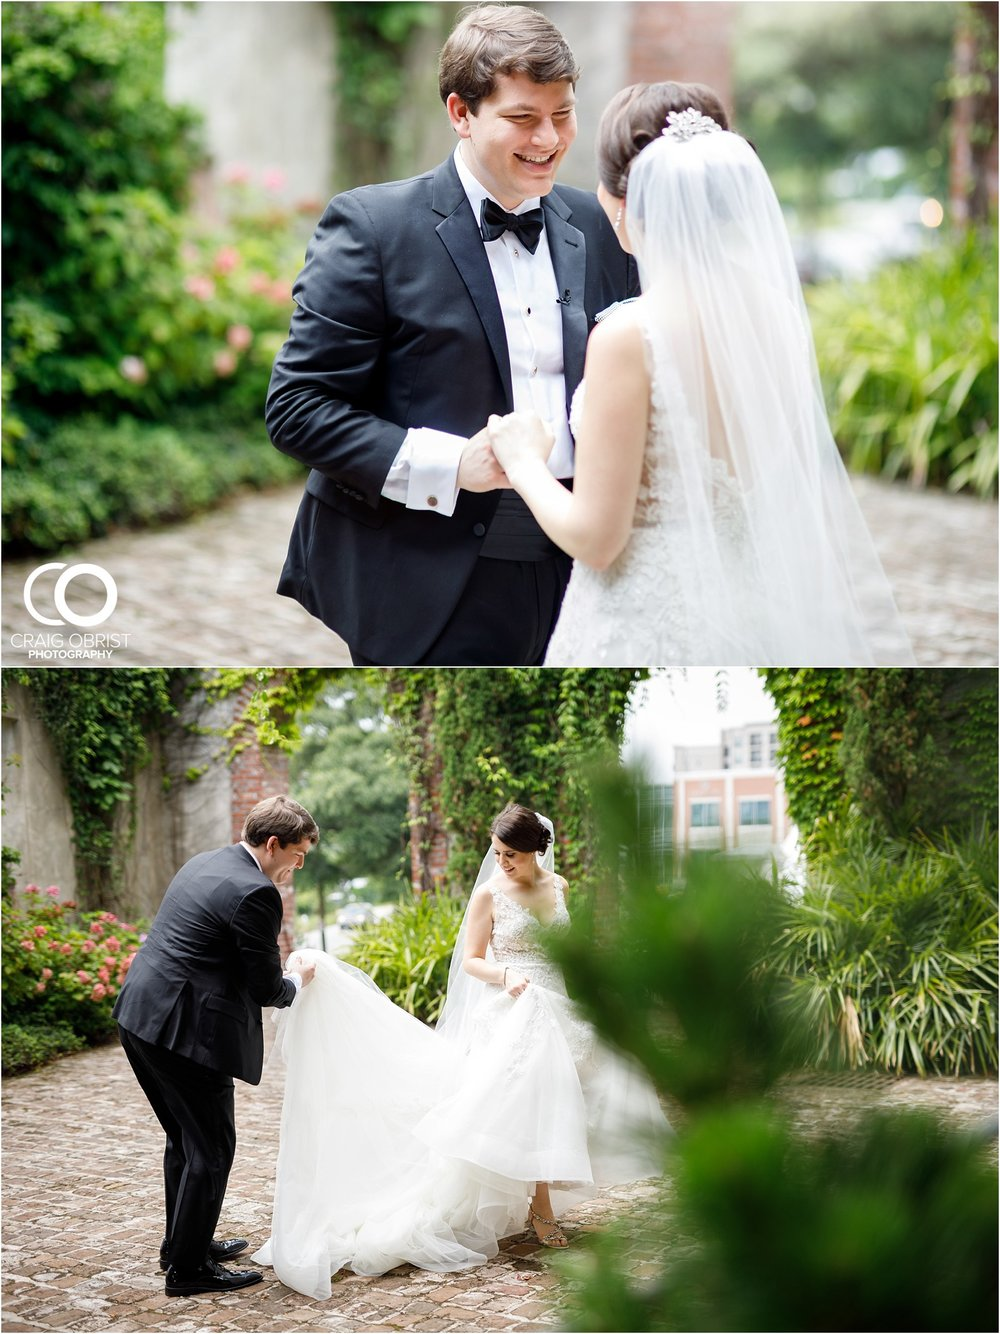 Four Seasons Hotel Atlanta Summerour Studio Wedding Portraits_0029.jpg